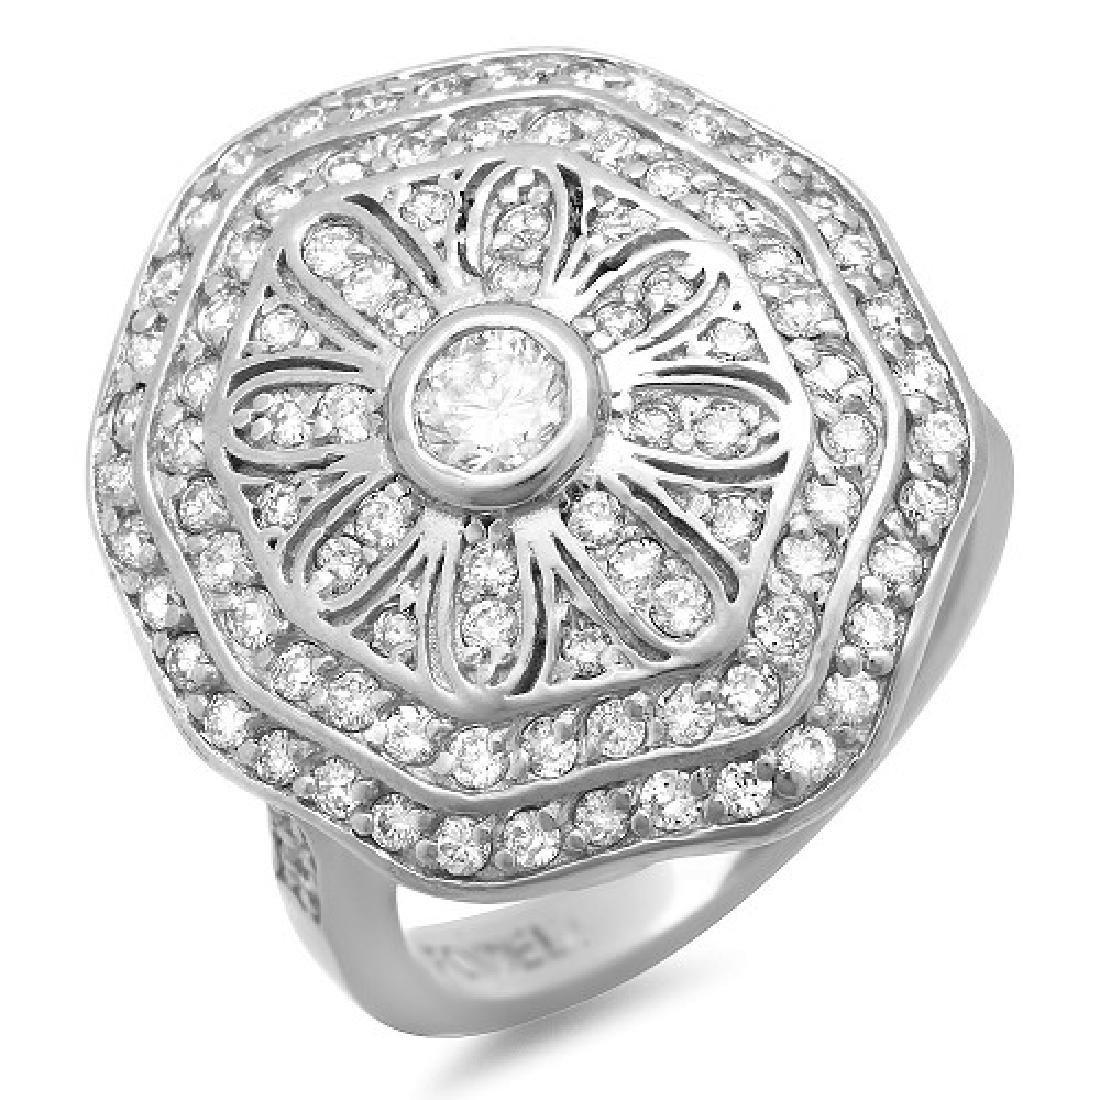 1.10 Carat Natural Diamond 18K Solid White Gold Ring